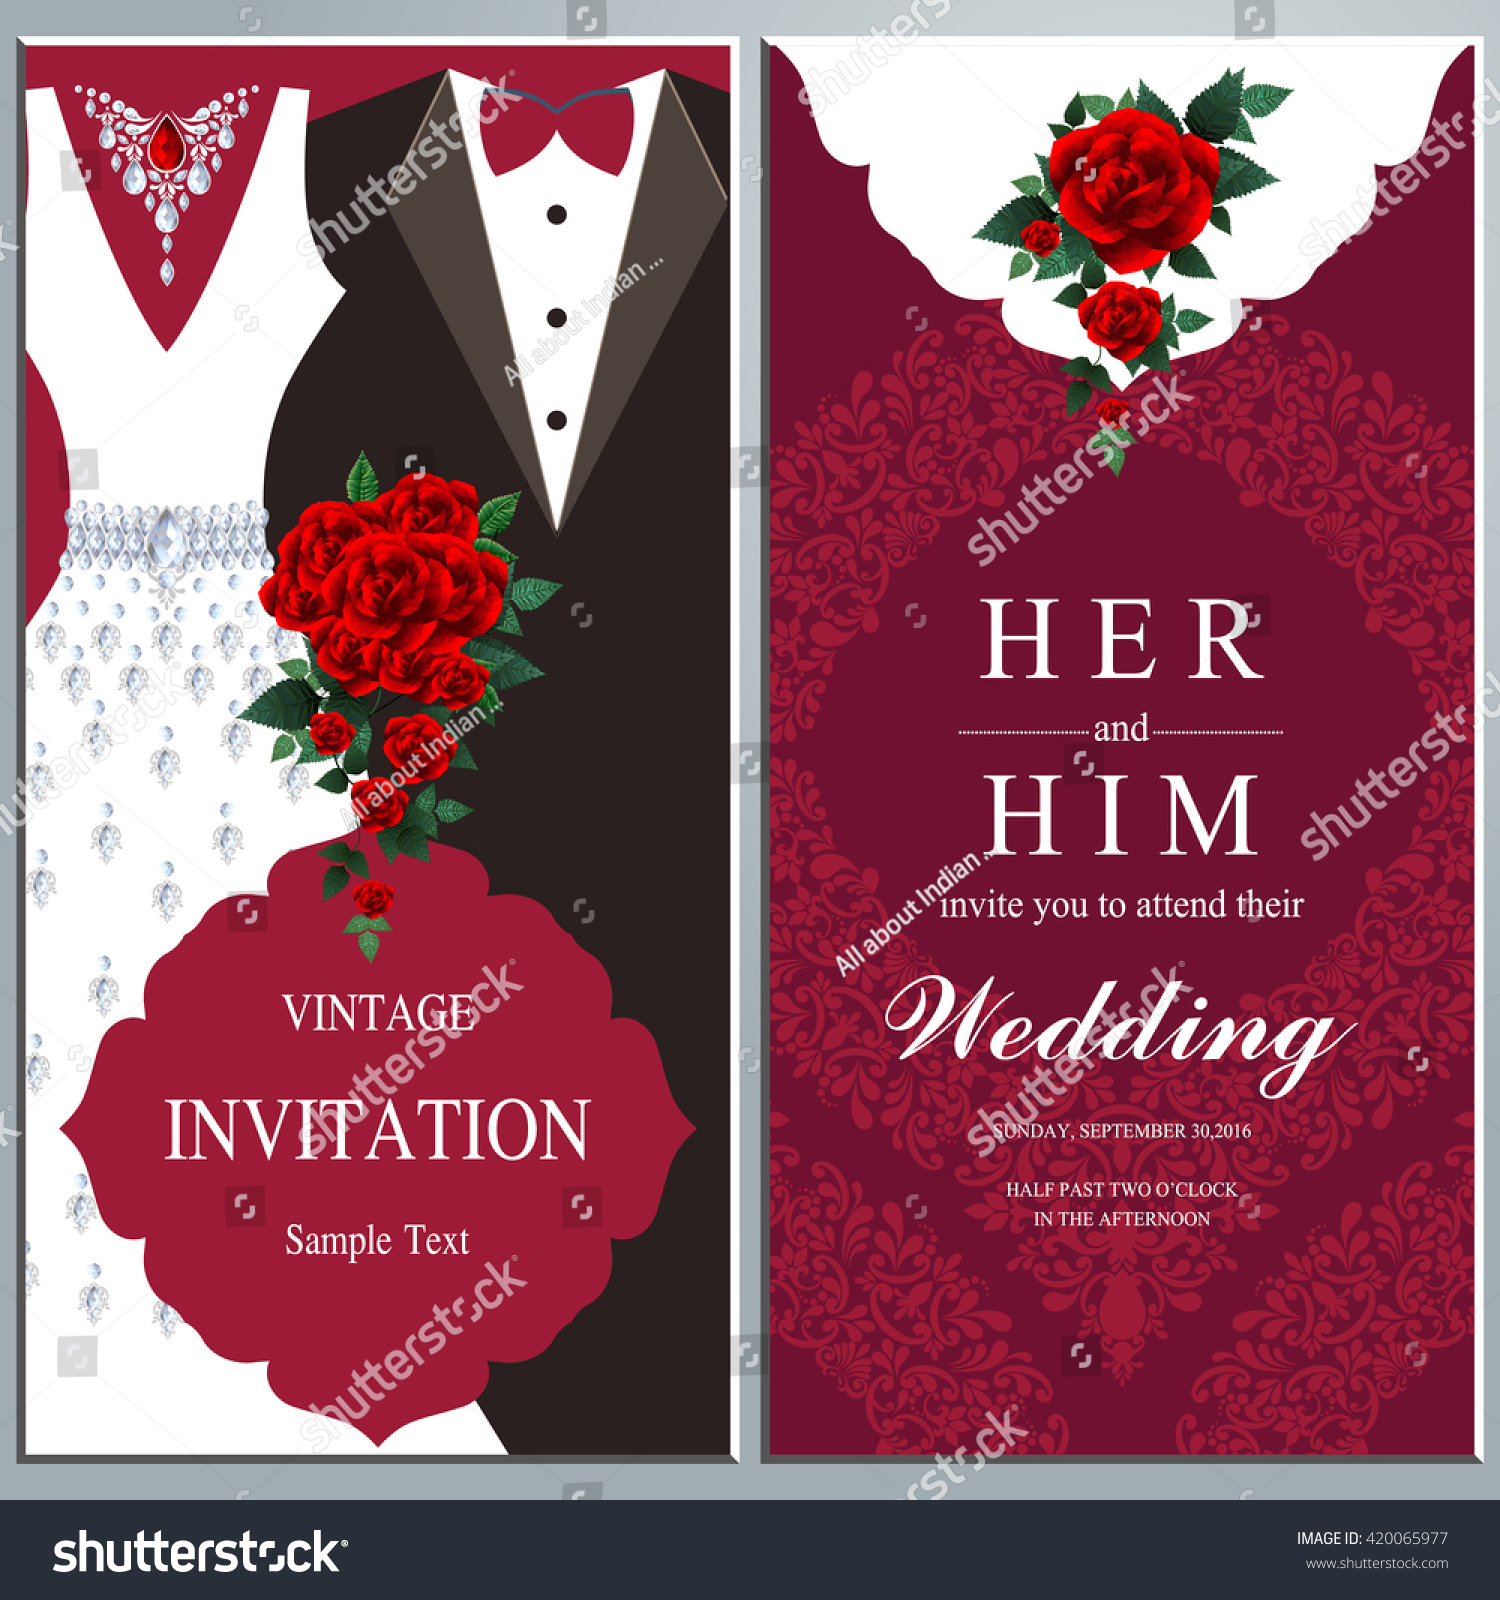 Wedding Invitation Card Bride Groom Dress Stock Vector (Royalty Free ...